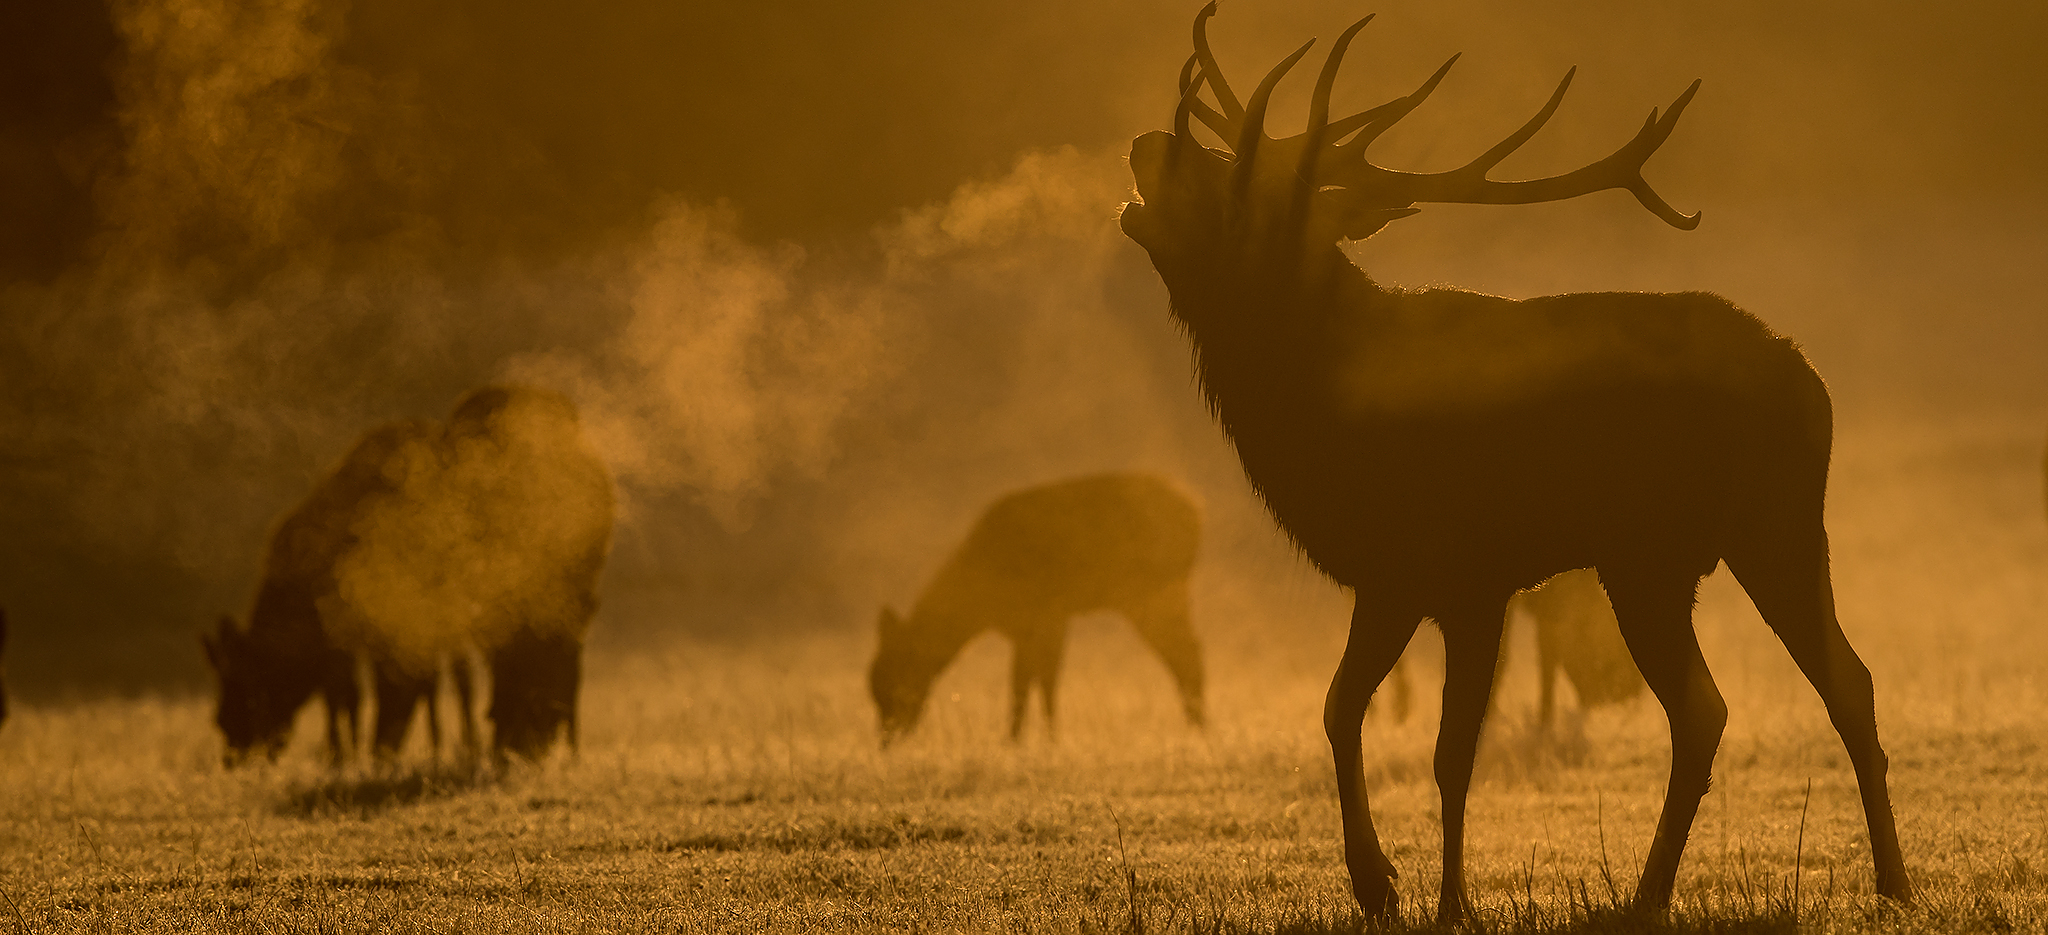 Deer - Natures Images regarding Bradgate Deer Rut 2021